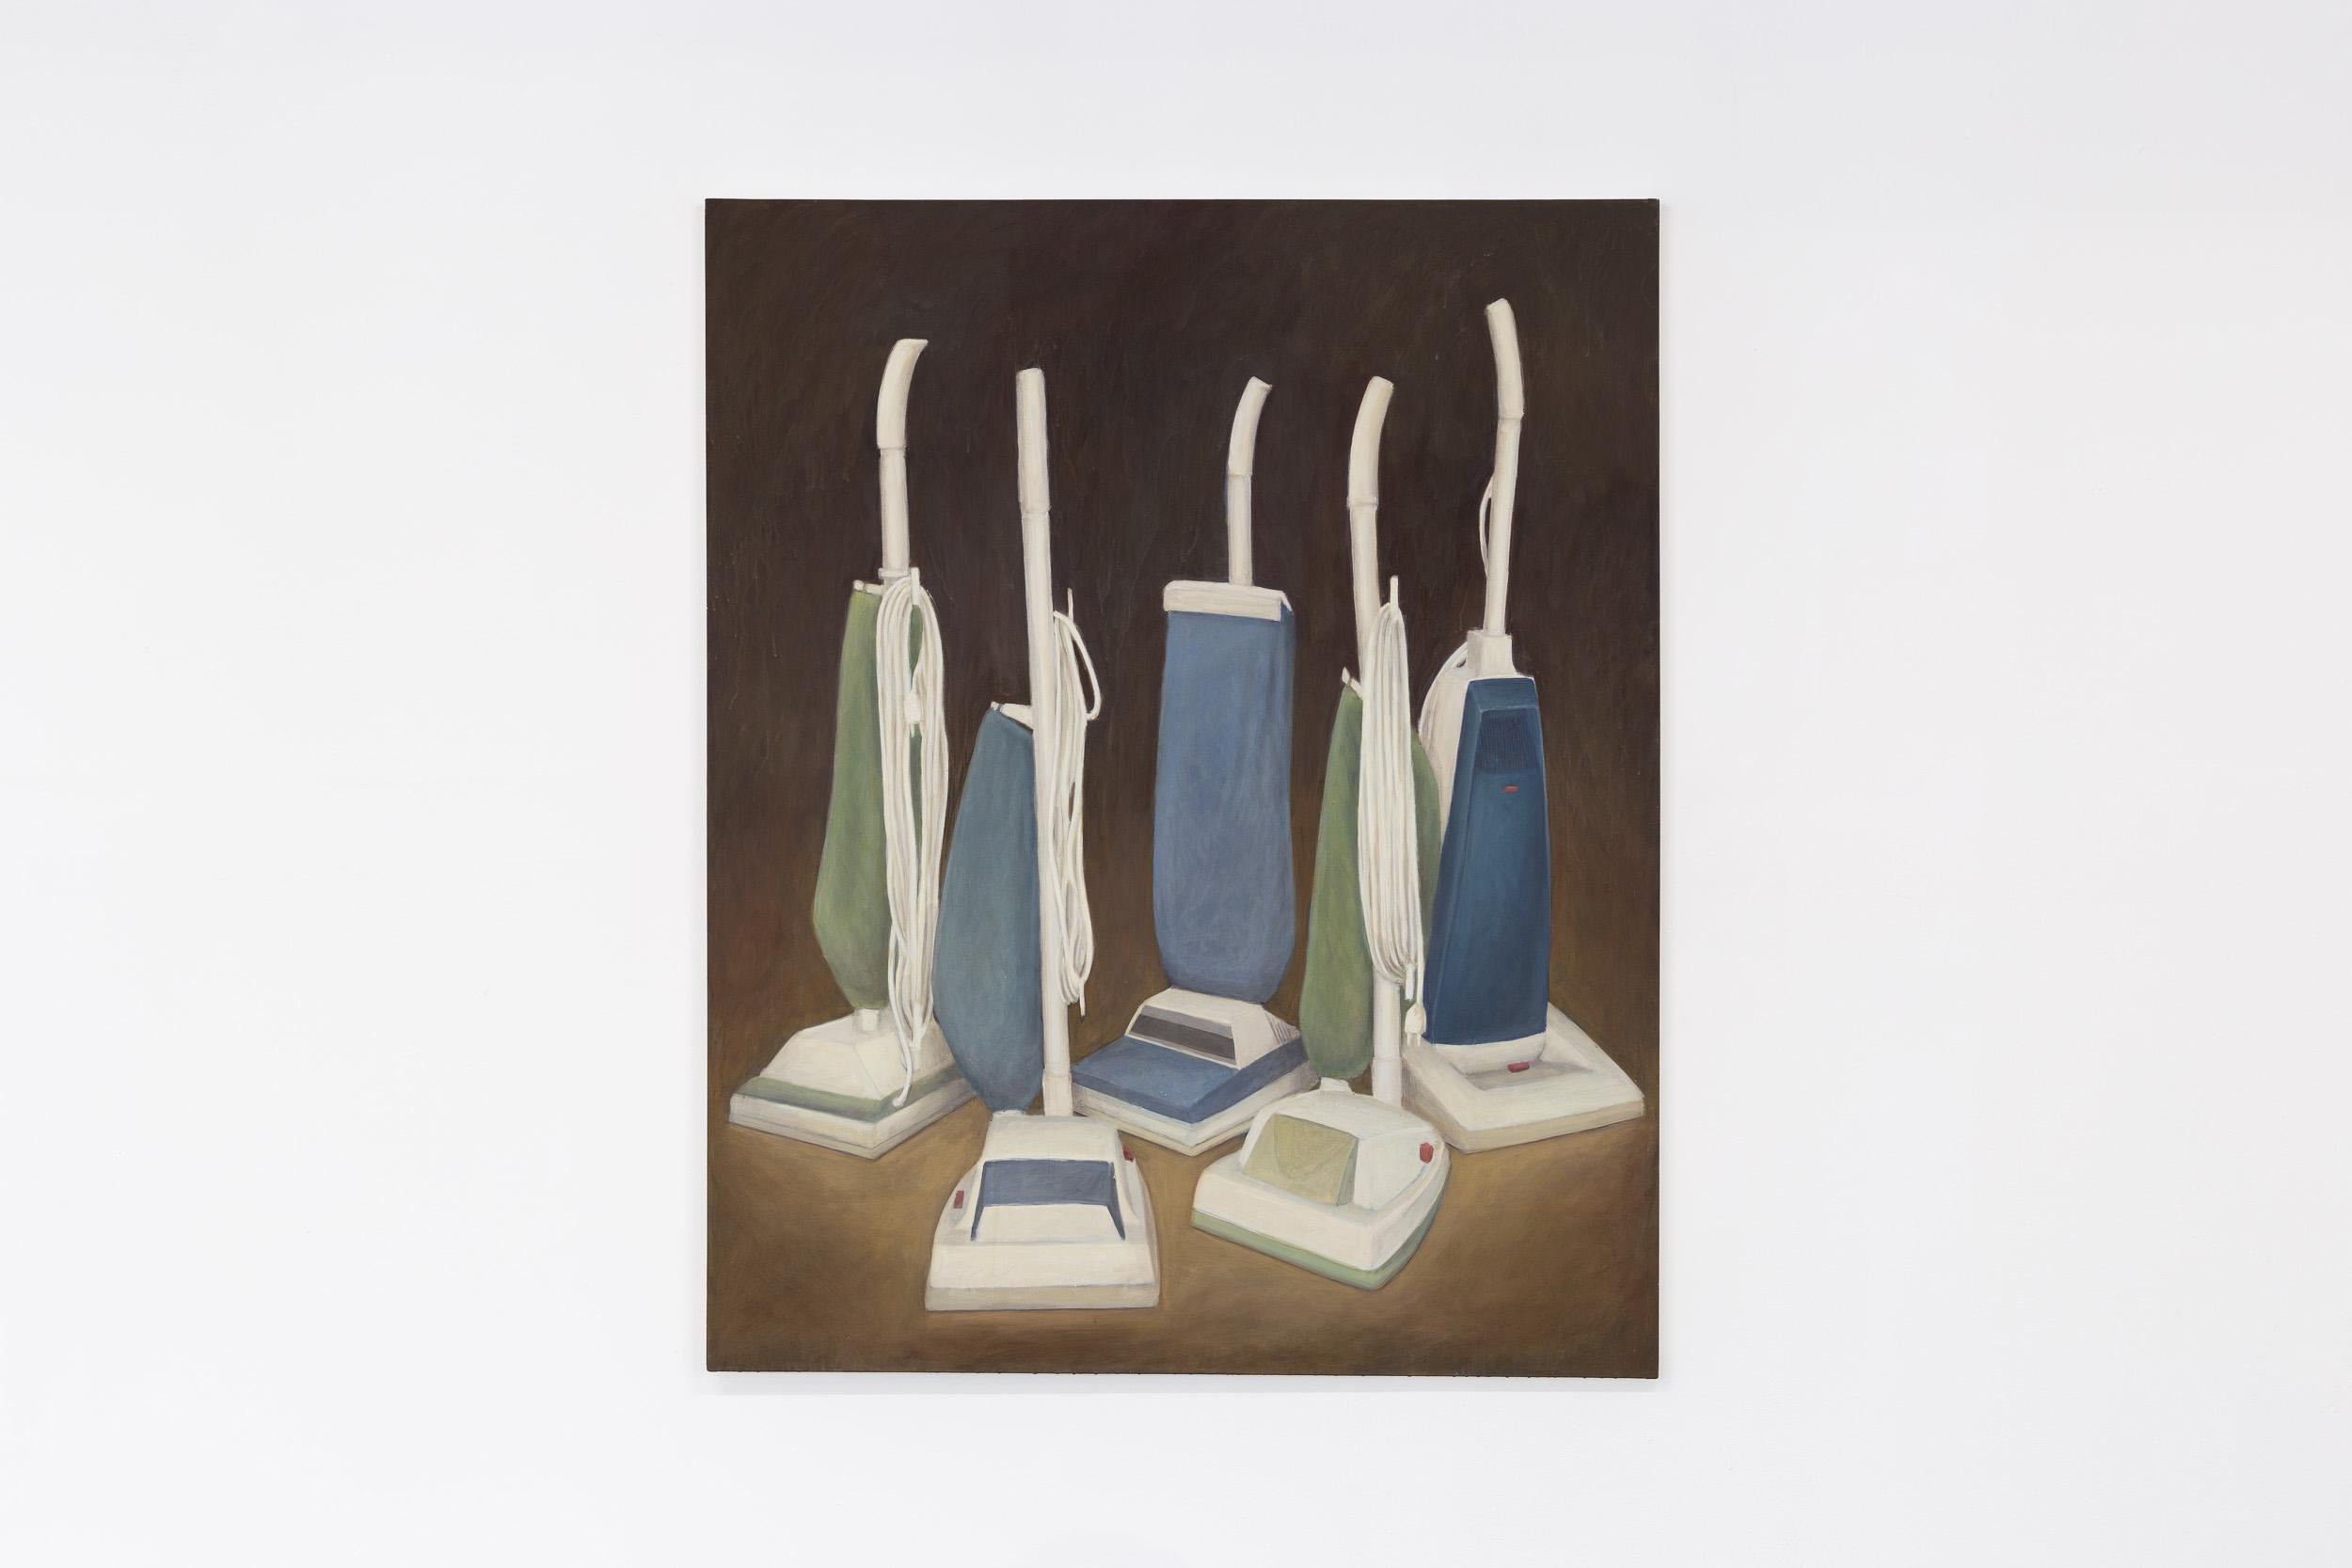 Christoph Hänsli,  The Congress , 1999, egg tempera and acrylic on canvas, 160 x 130 cm  Photo: Kilian Bannwart